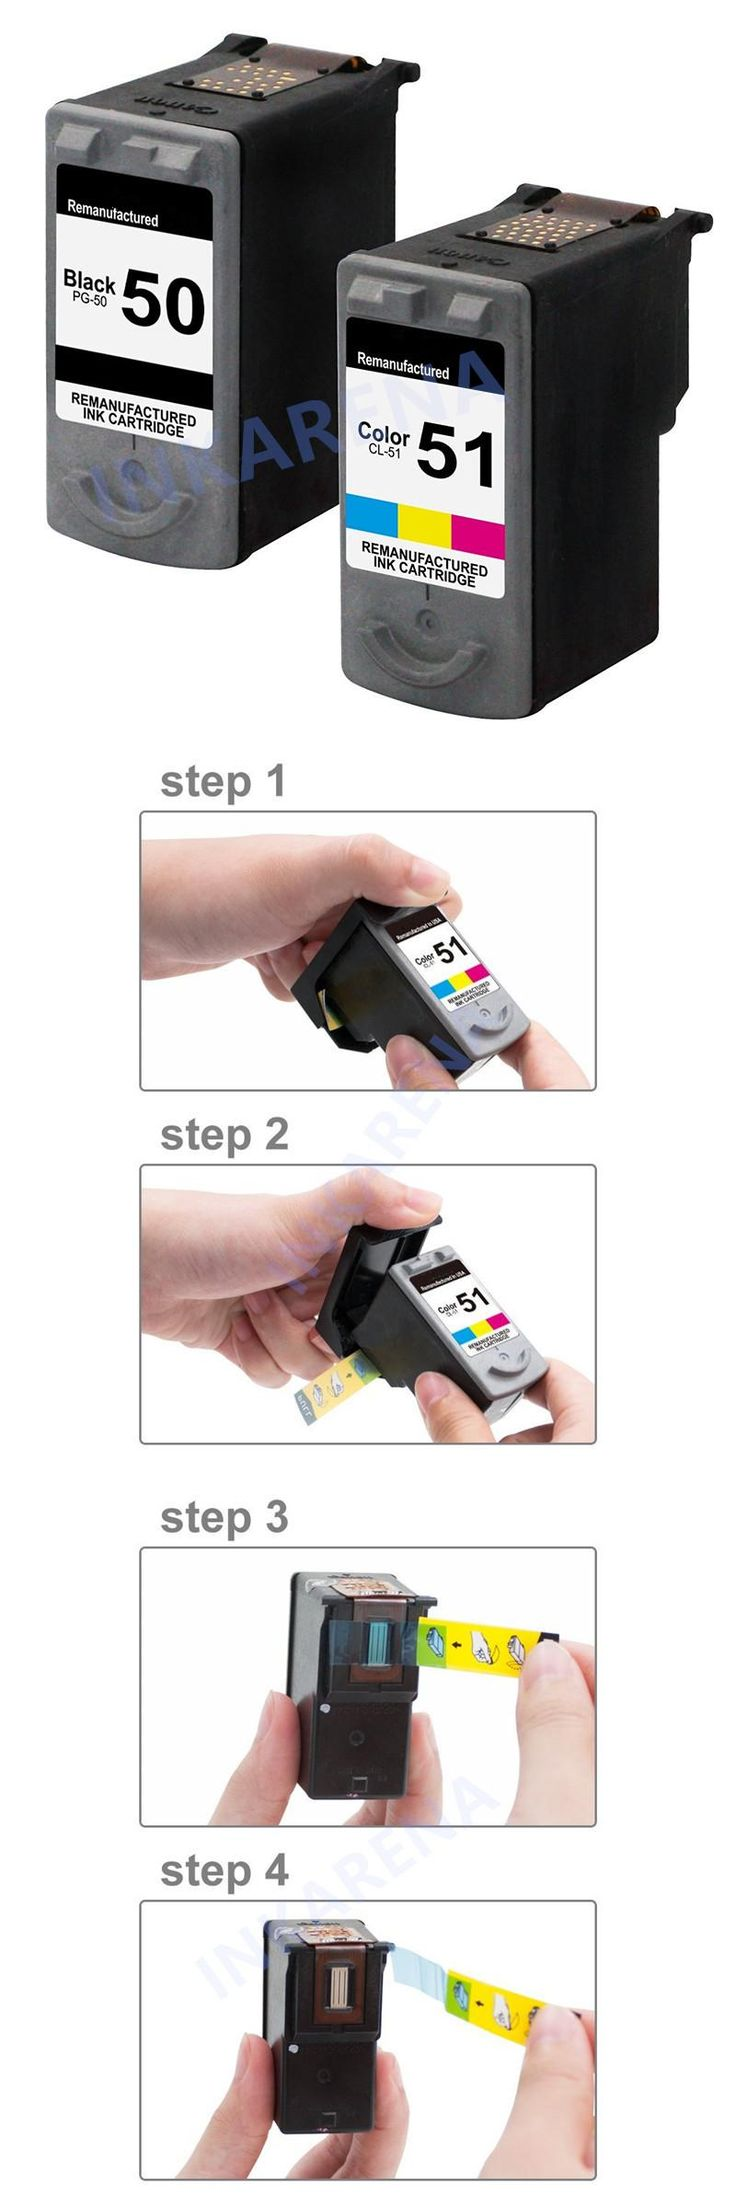 [Visit to Buy] 1Set Ink Cartridges PG 50 CL 51 PG50 CL51 For Canon Pixma iP2200 iP6210D iP6220D MP150 MP160 MP170 MP180 MP450 MP460 MX300 MX310 #Advertisement